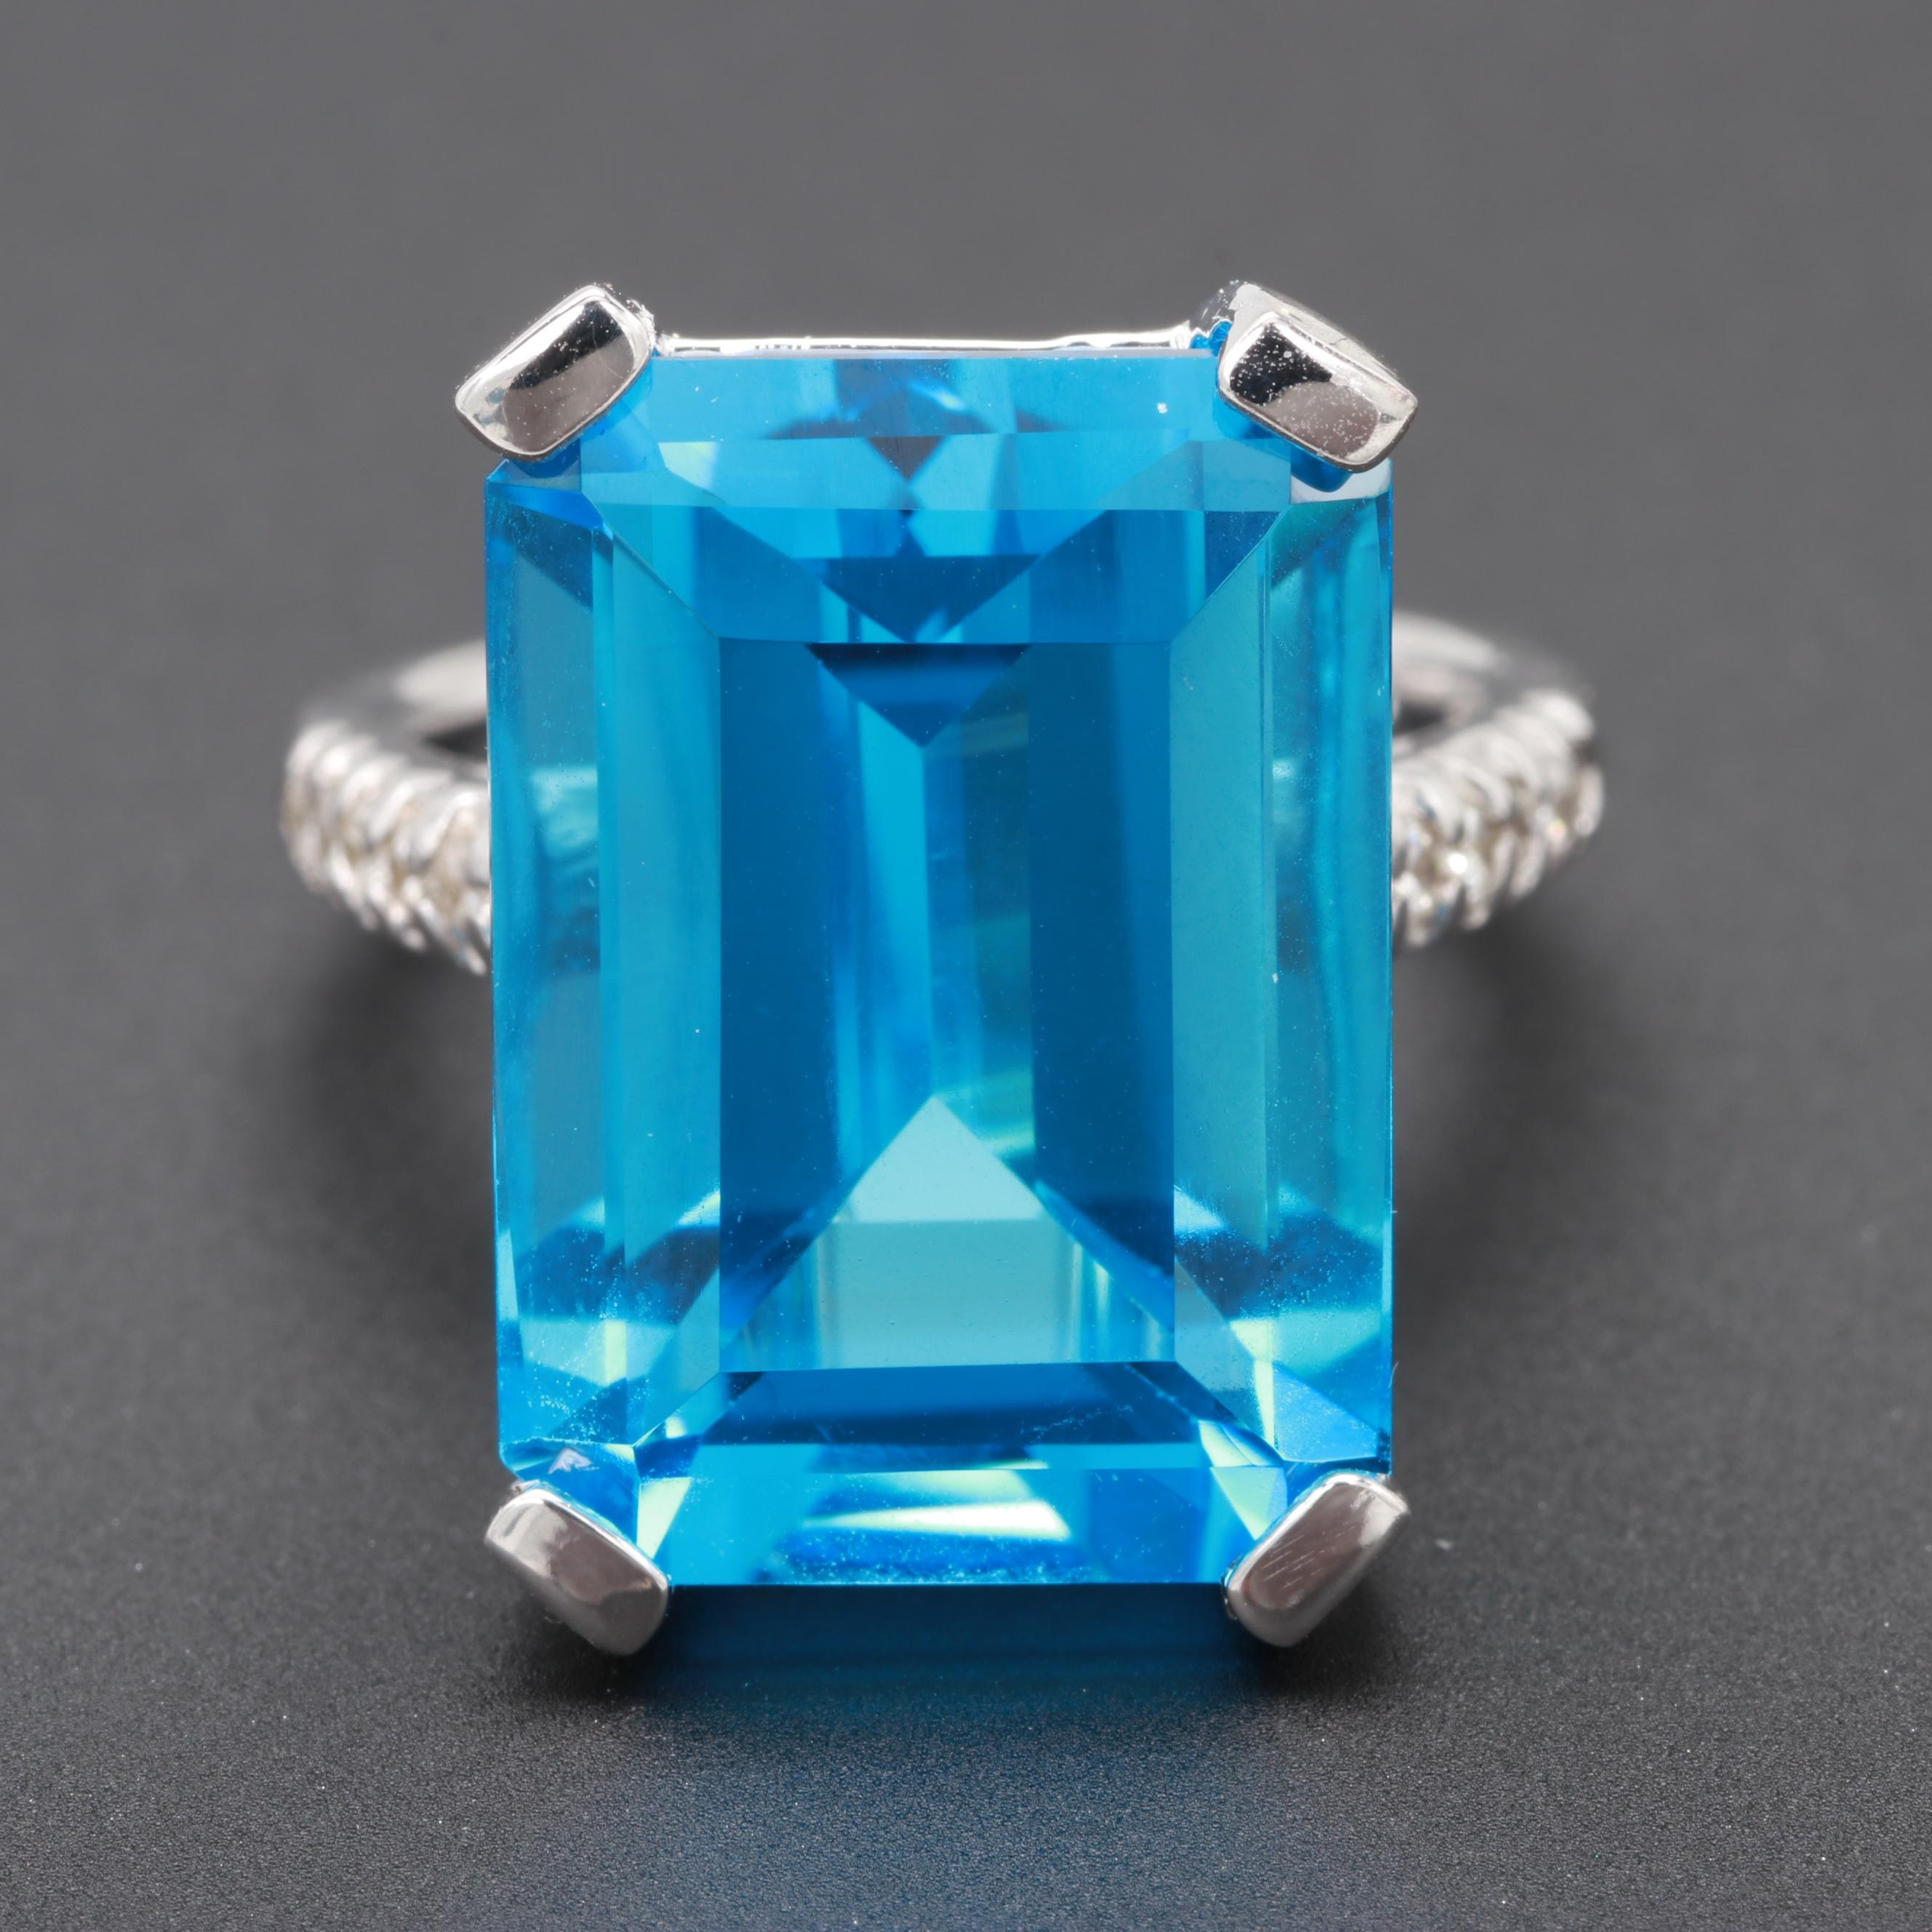 14K White Gold 19.27 CT Topaz and Diamond Ring